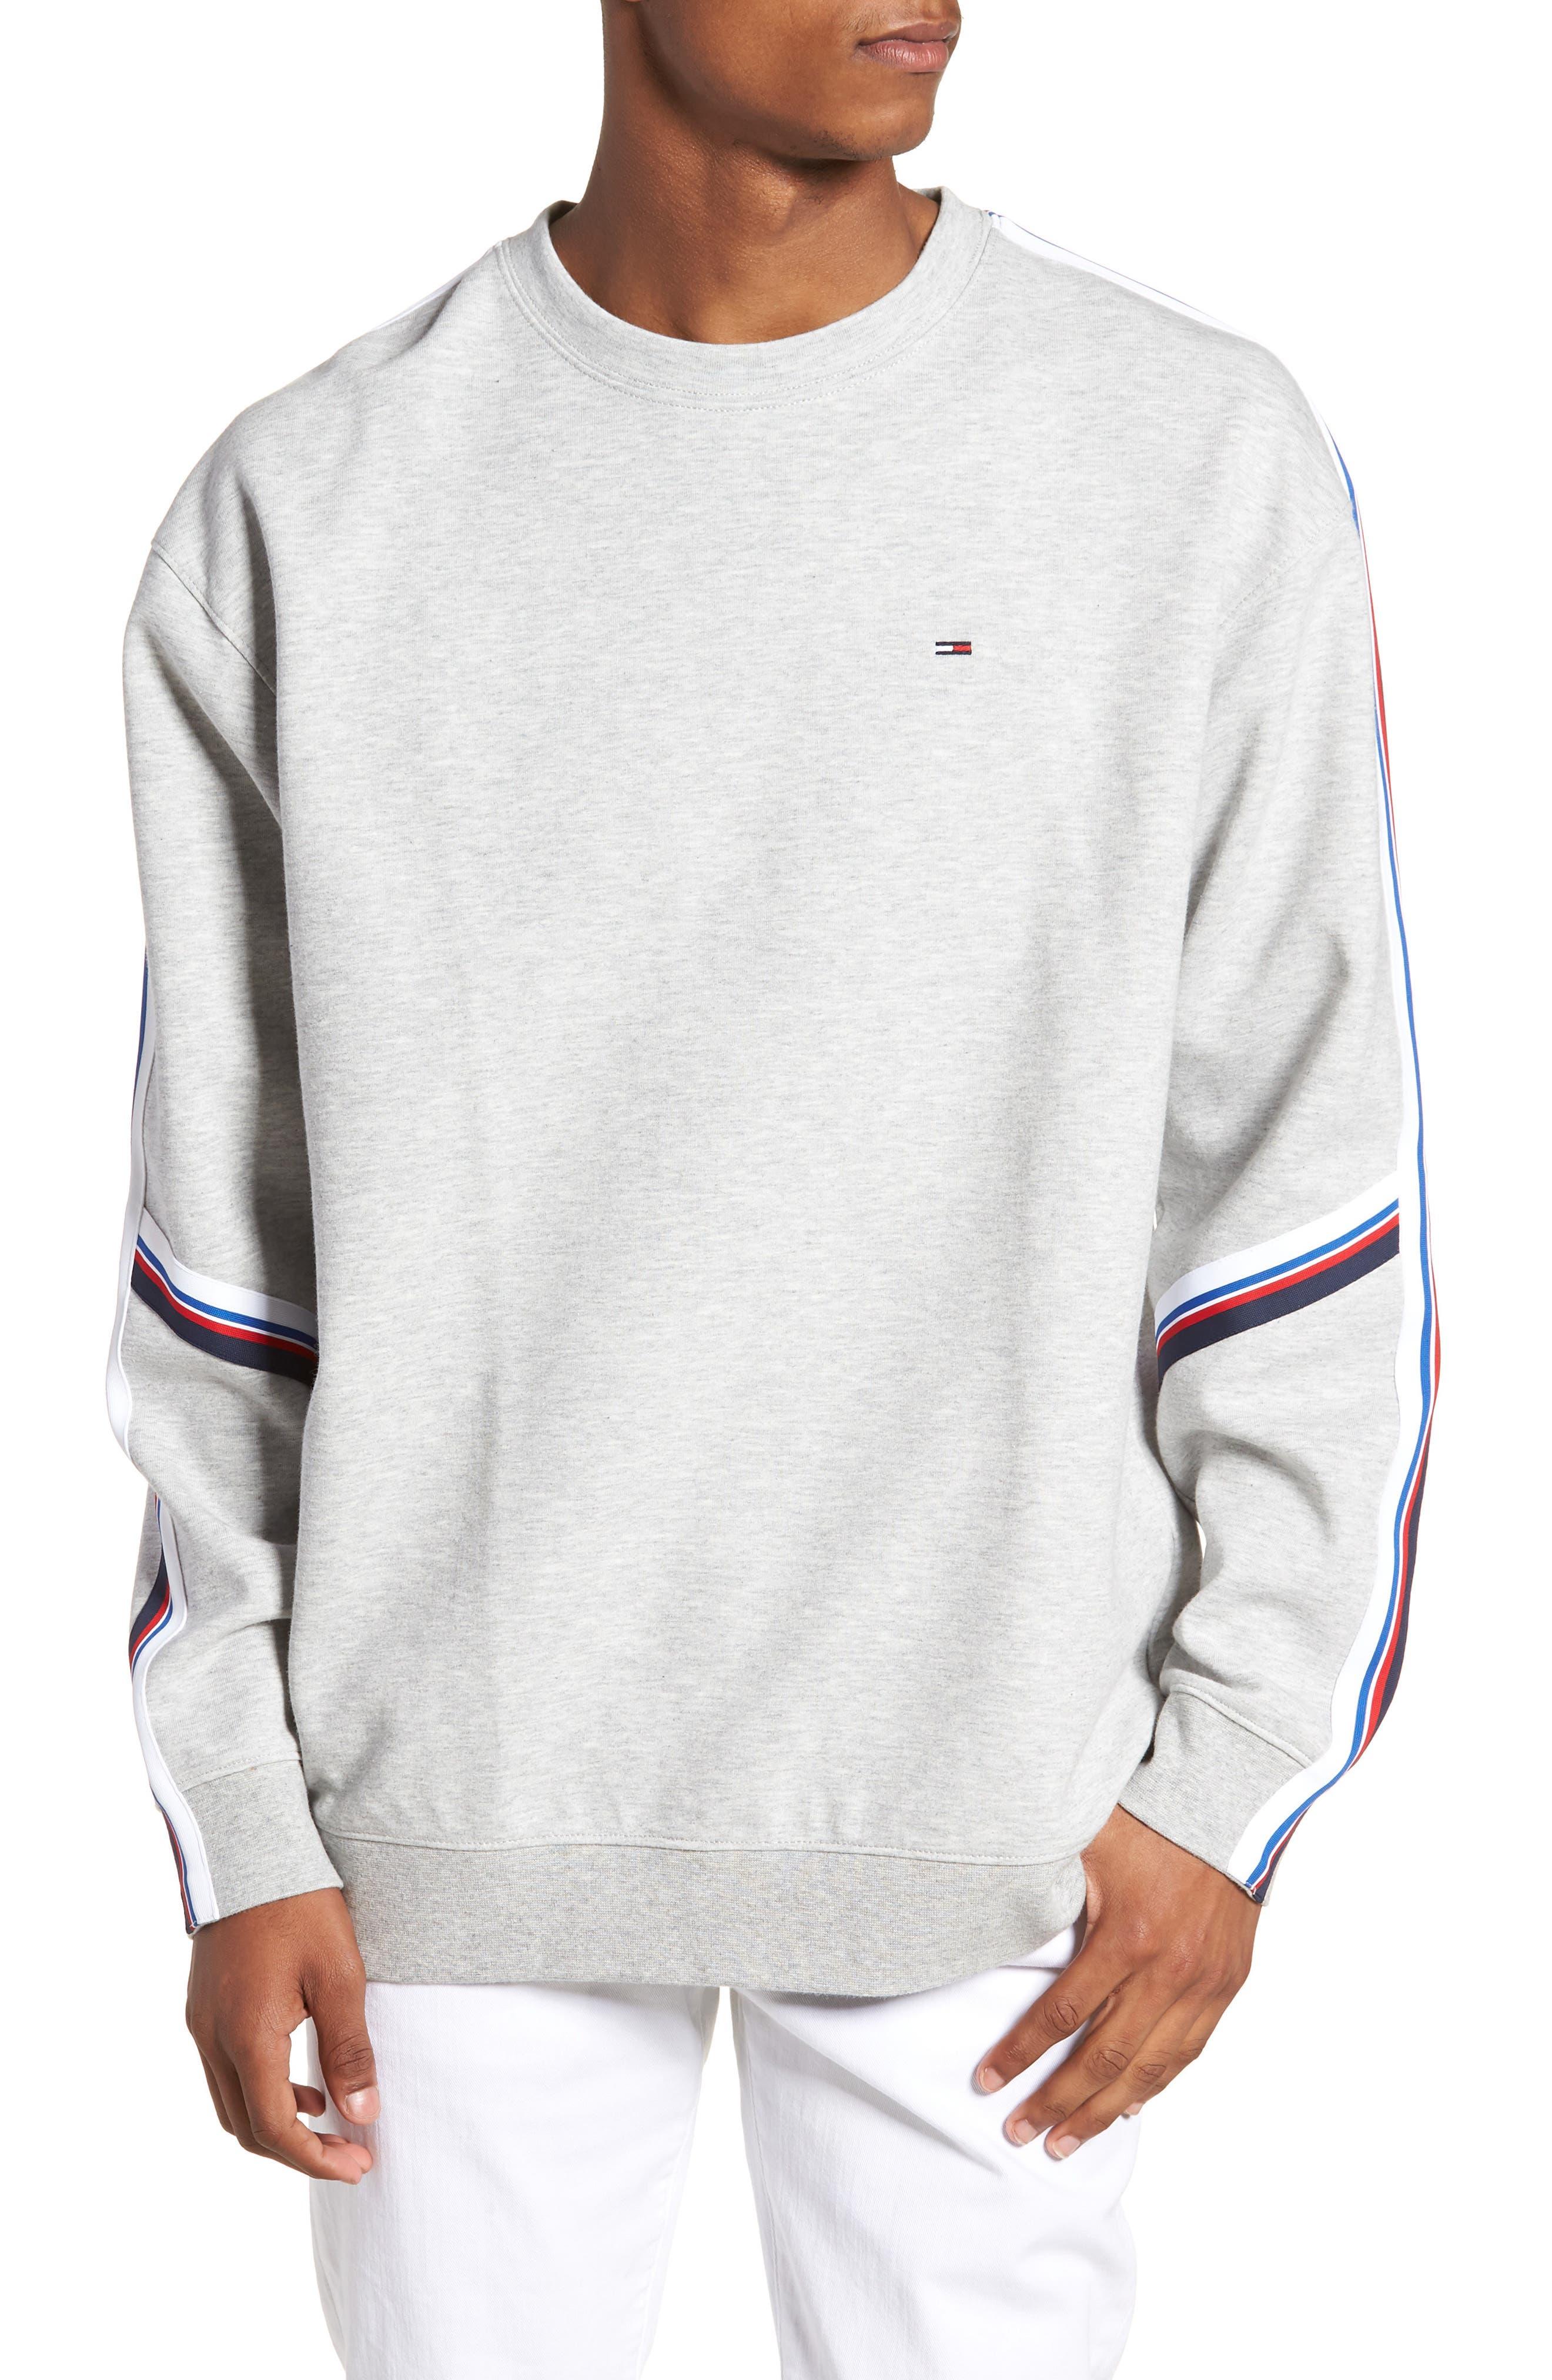 Main Image - TOMMY JEANS Racing Stripe Sweatshirt